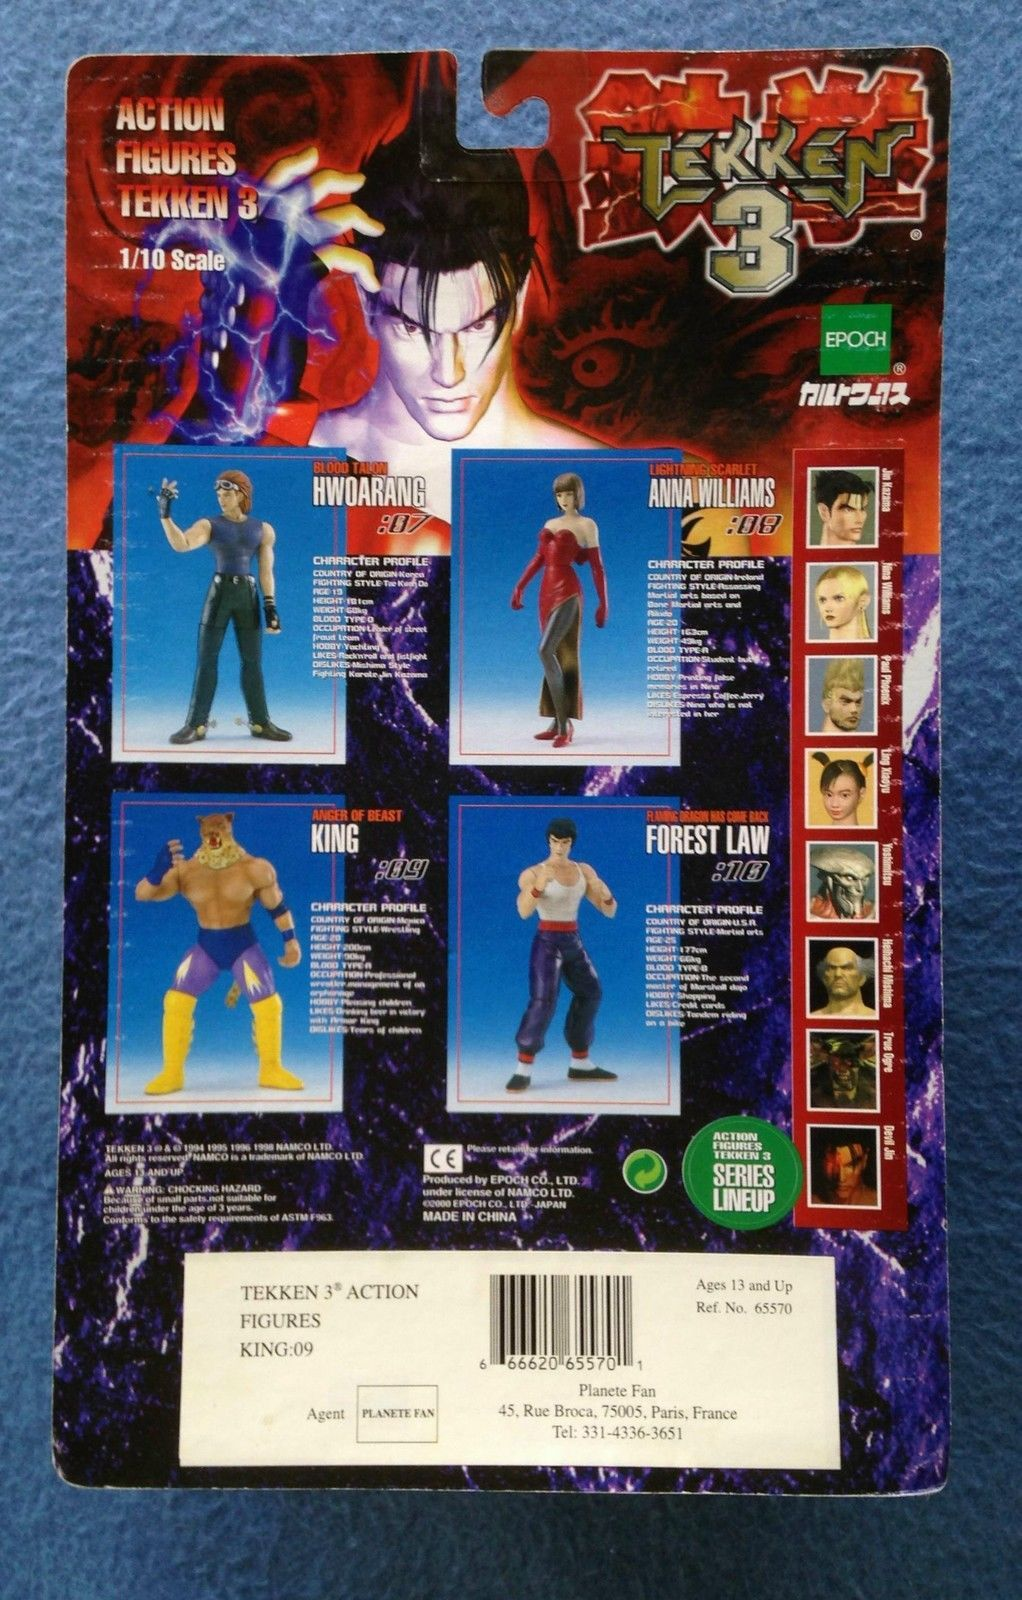 King Anger Of Beast Tekken 3 1998 Epoch 1 10 Scale 7 Inch Figure Hiroki Hayashi Epoch Tekken 3 Figures